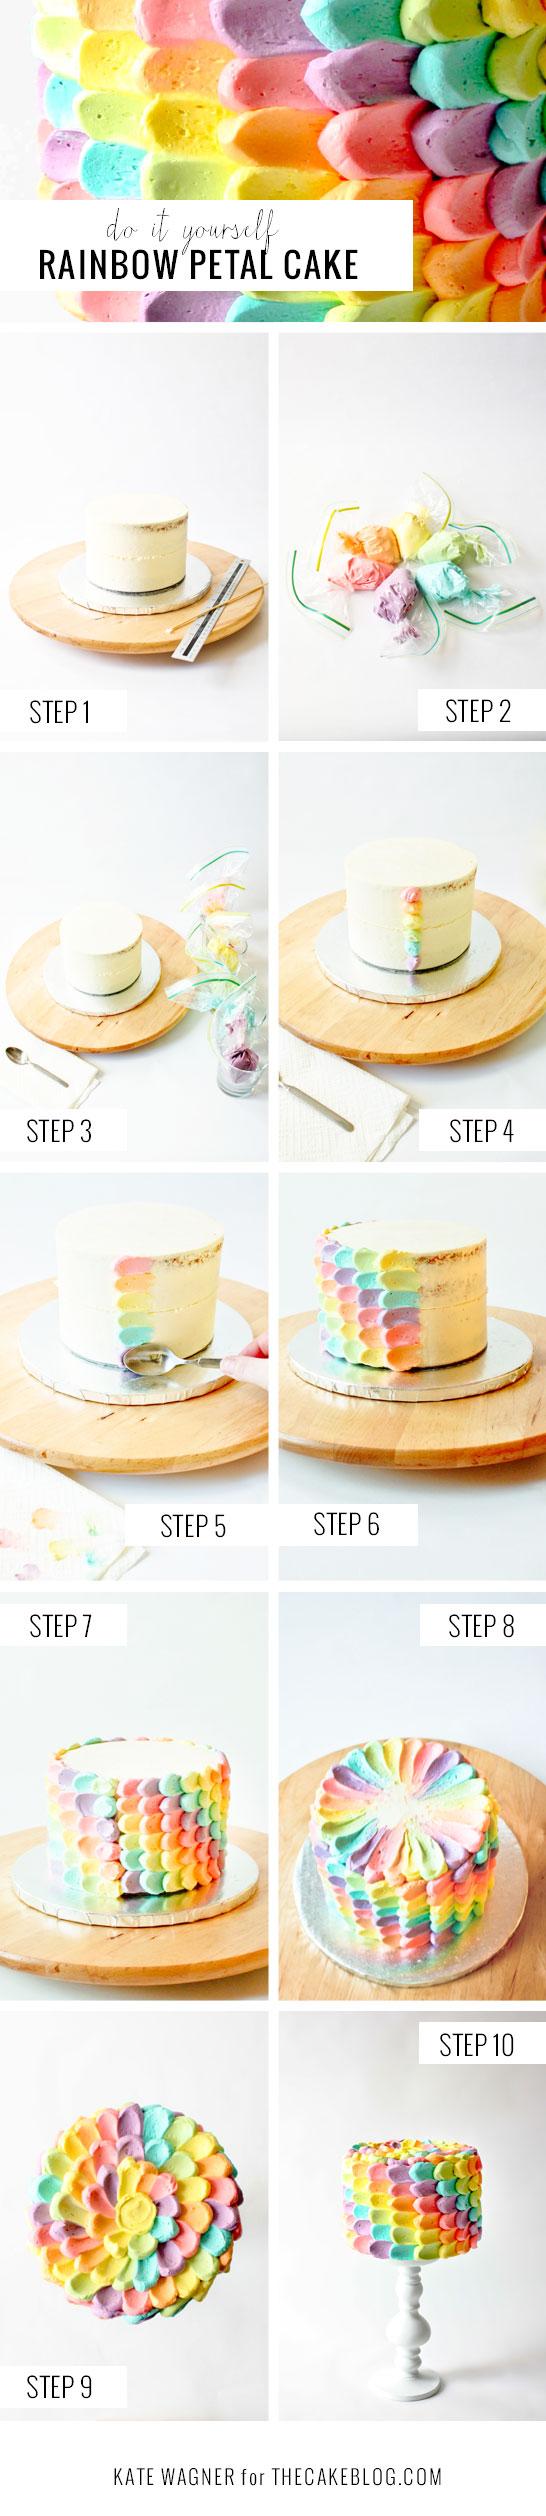 DIY Rainbow Petal Cake  |  by Kate Wagner  |  TheCakeBlog.com